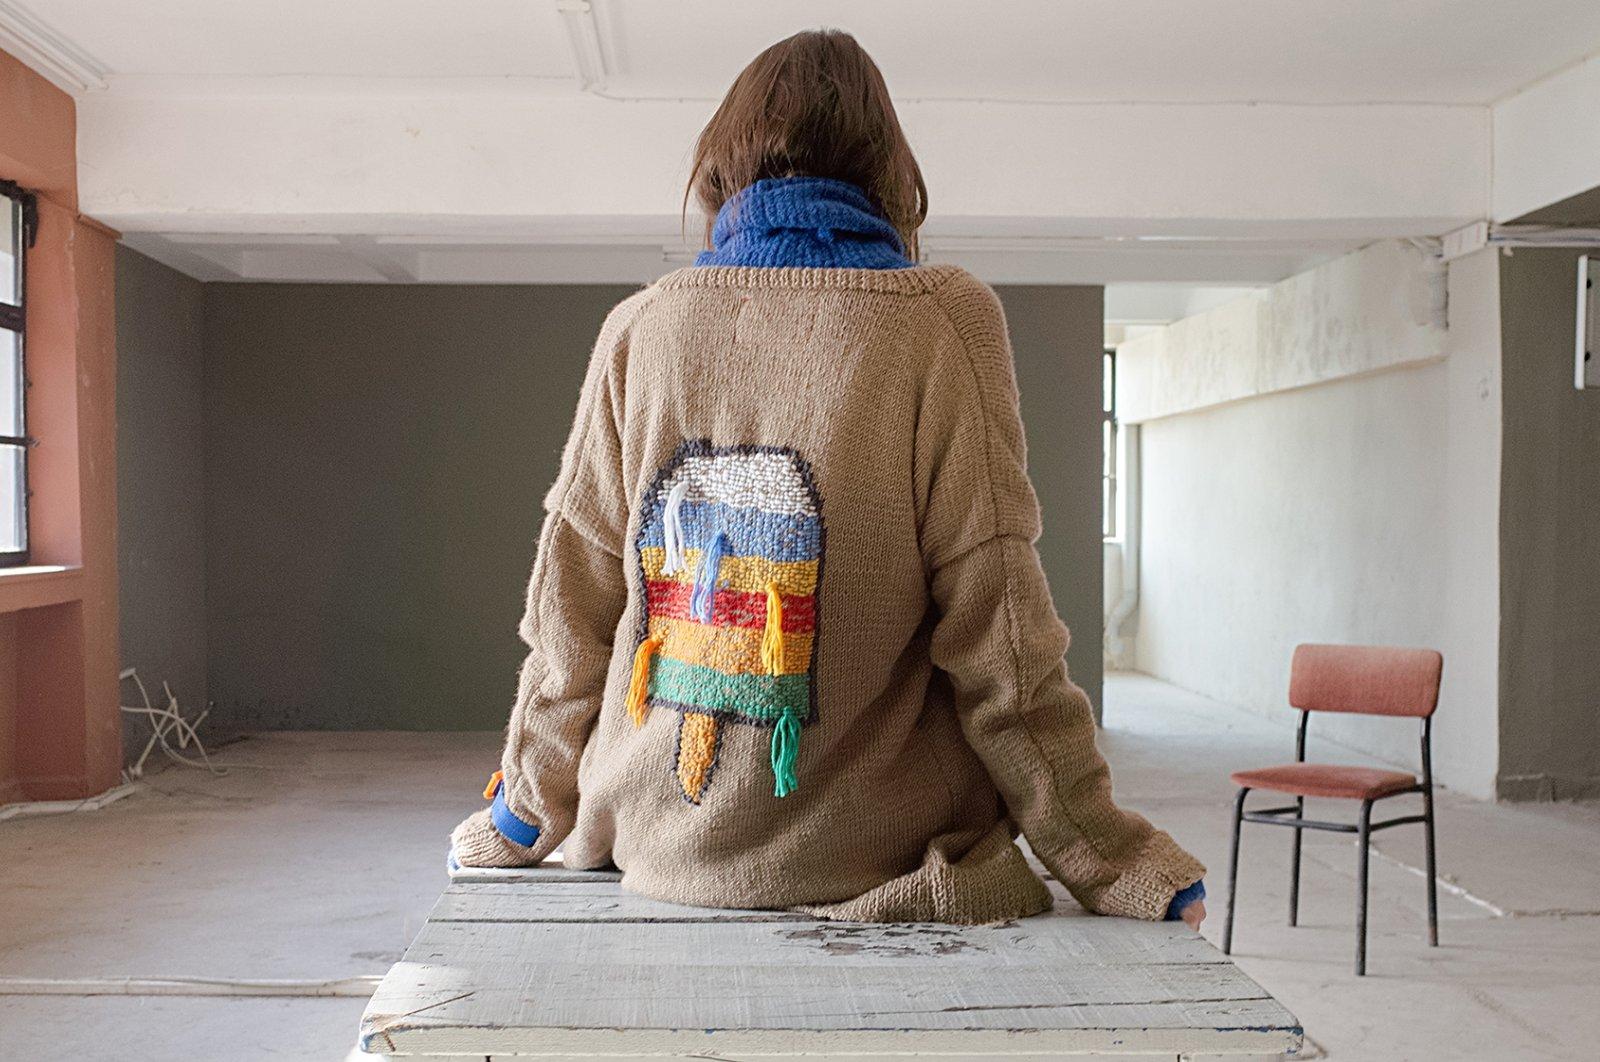 Incomplit is a community-engaged art and fashion studio. (Photo courtesy of Öykü Özgencil)